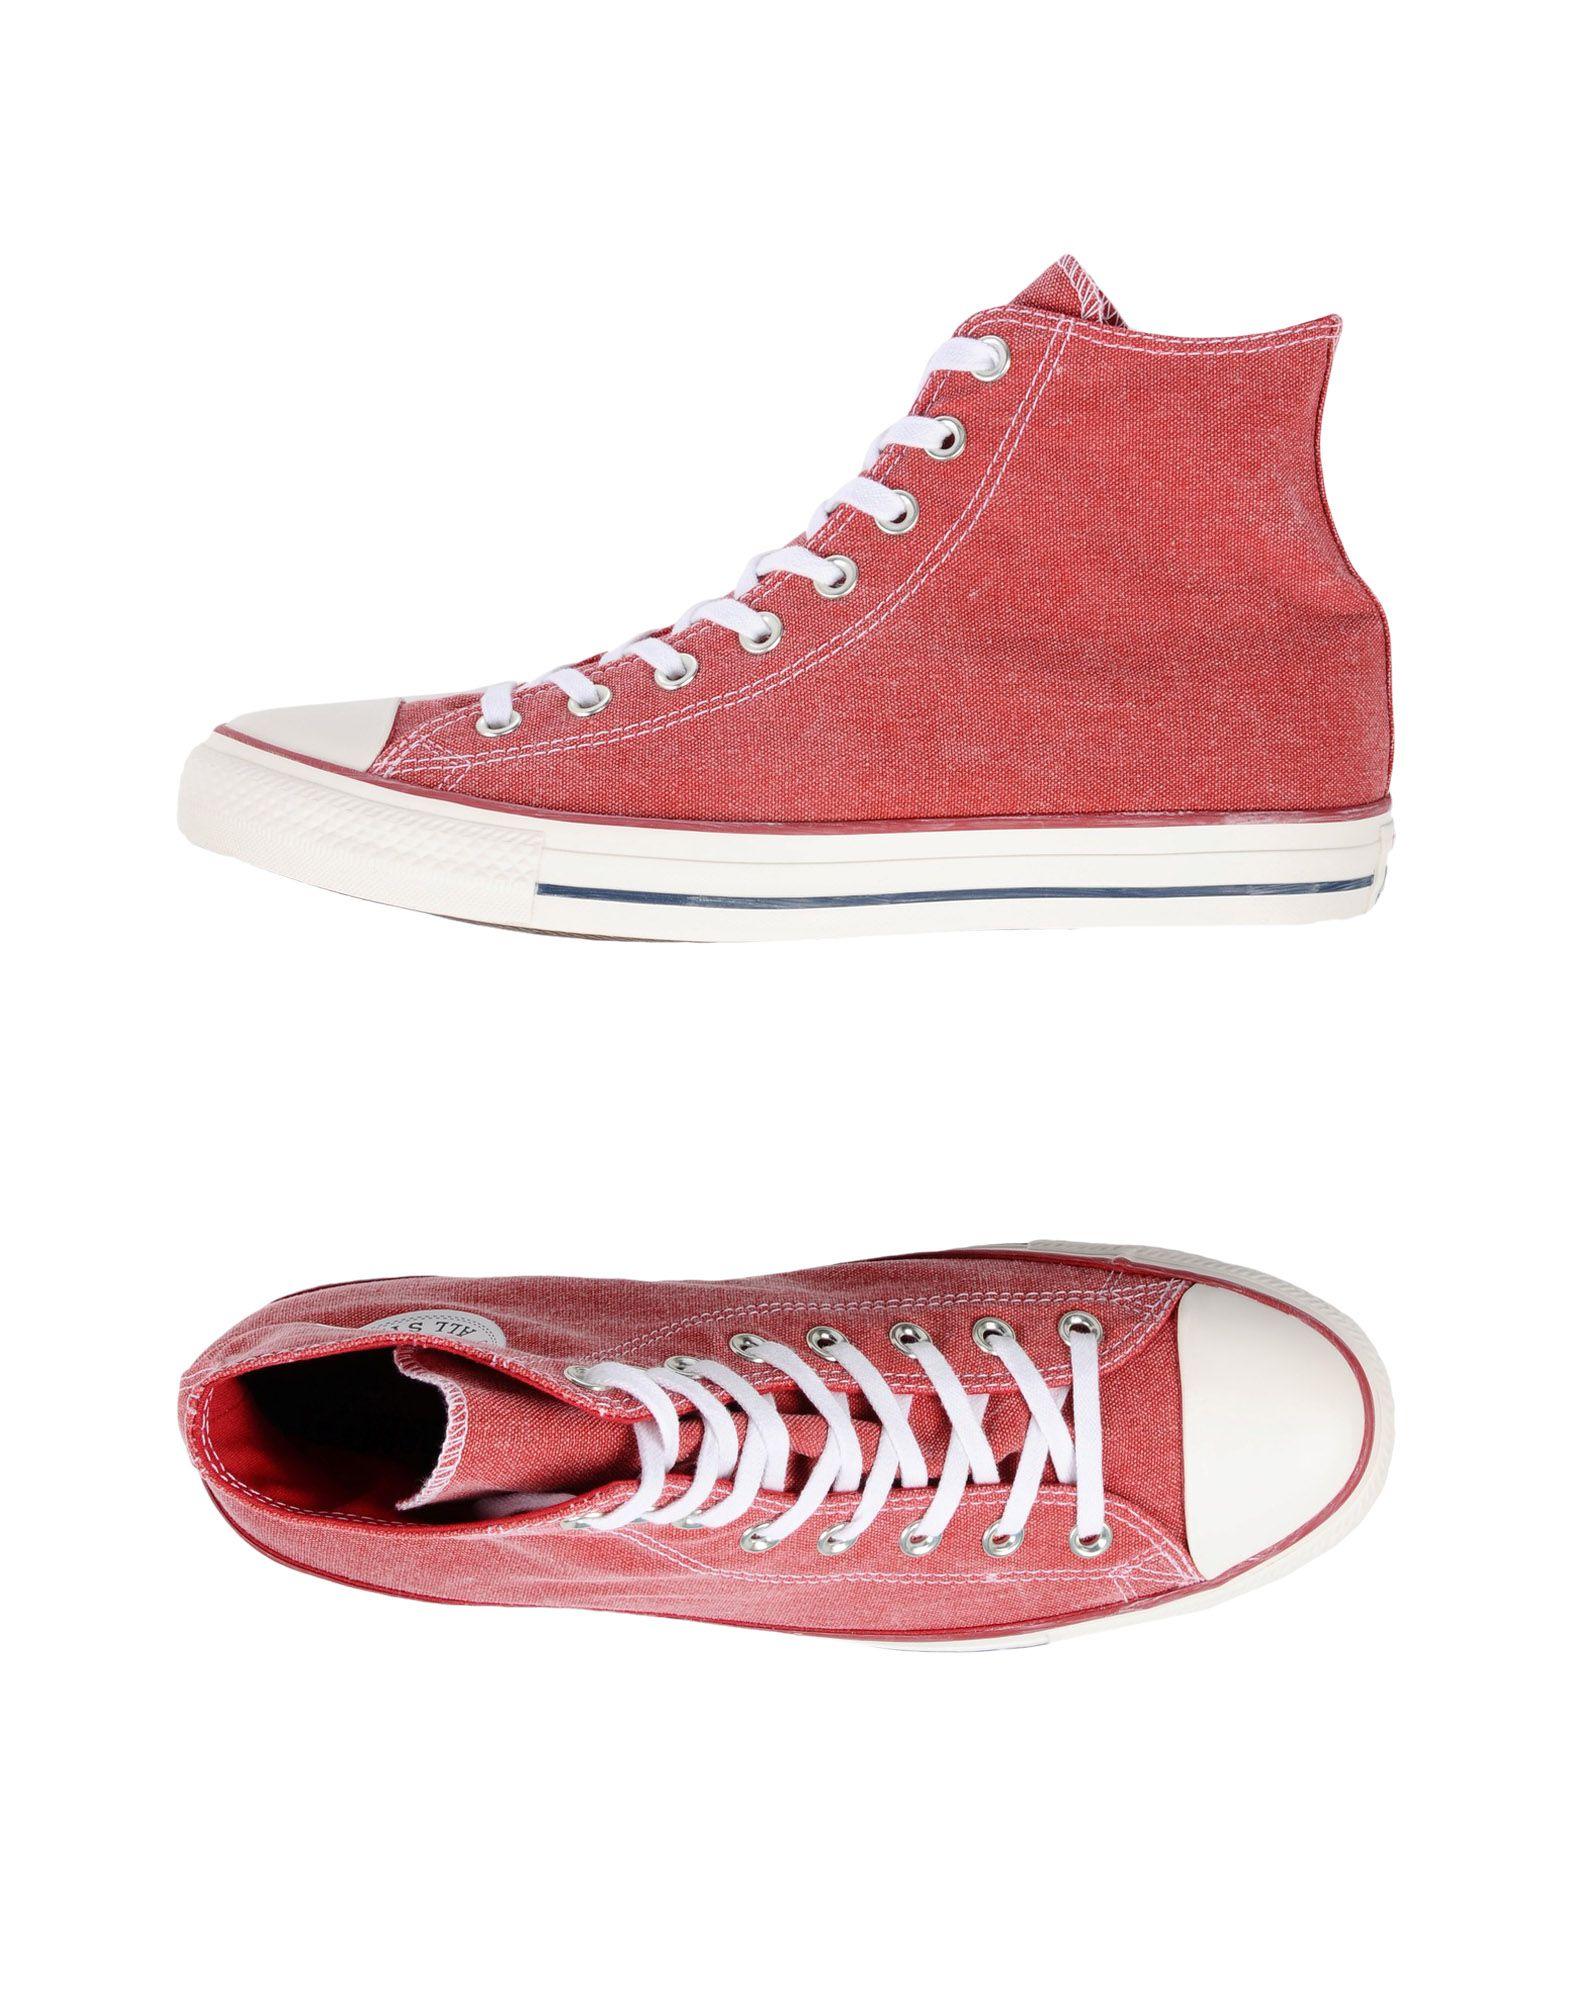 Converse All Destroyed Star Ctas Hi Denim Destroyed All - Sneakers - Men Converse All Star Sneakers online on  United Kingdom - 11440016TD 397dbf